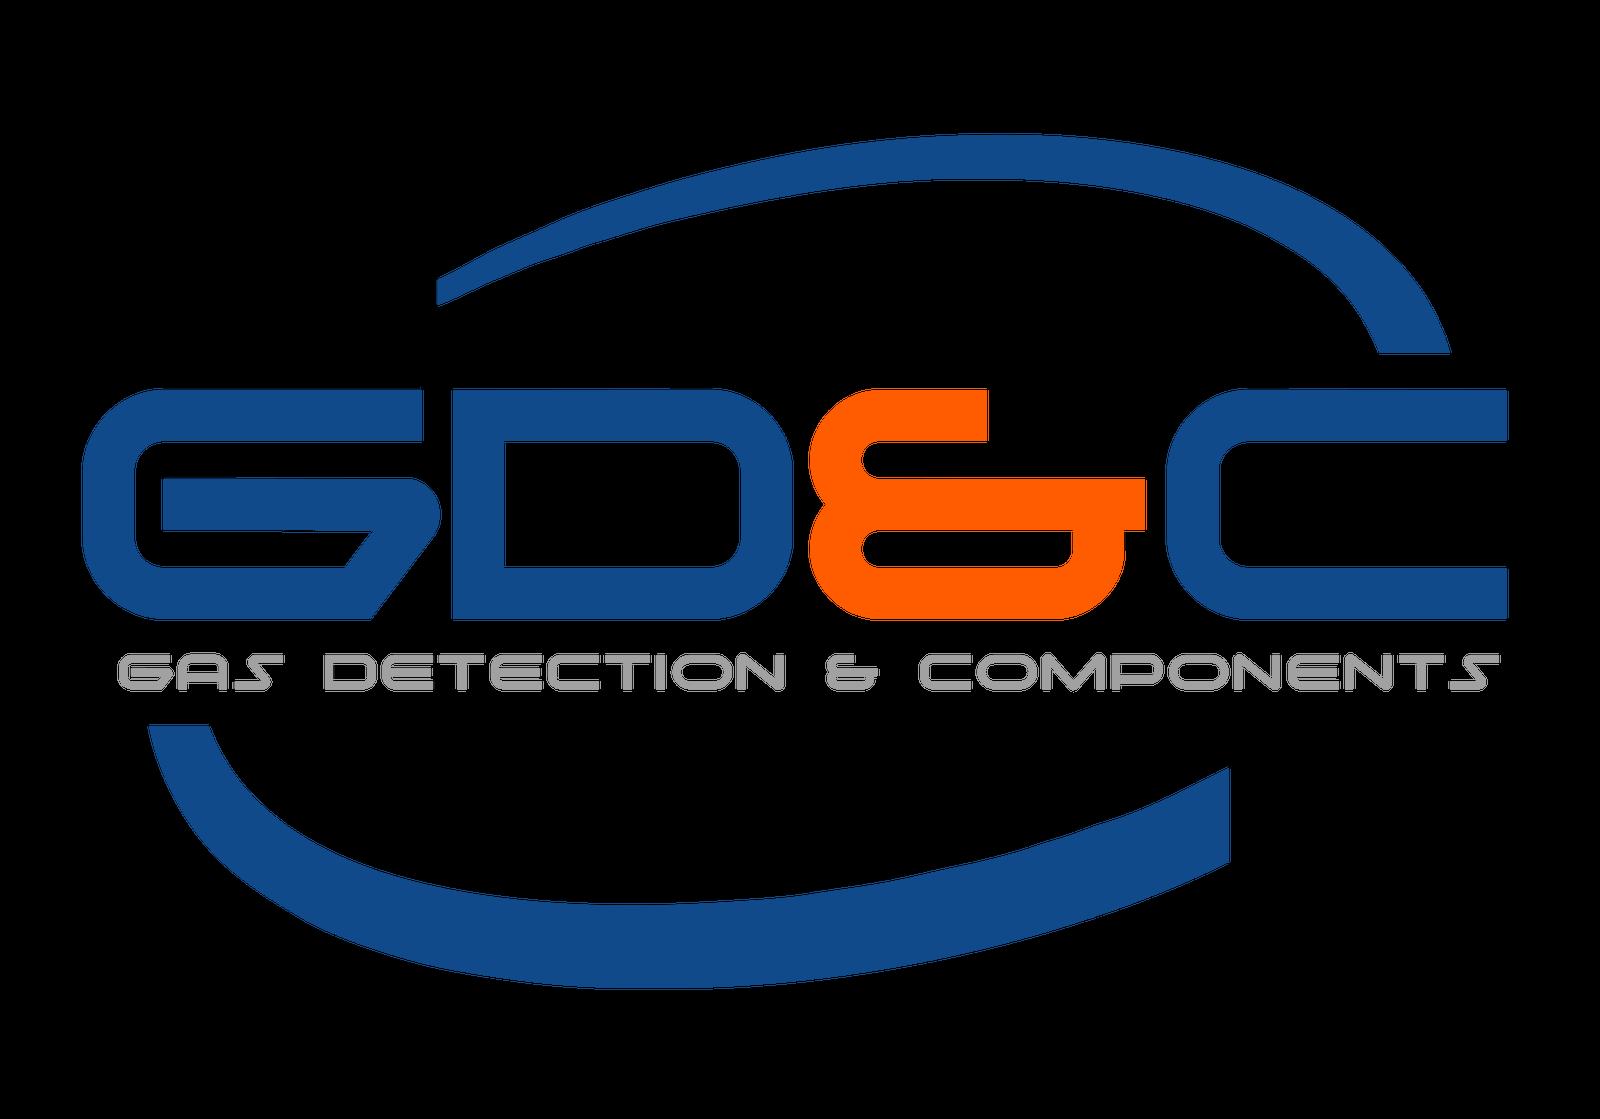 gasdetectionandcomponents